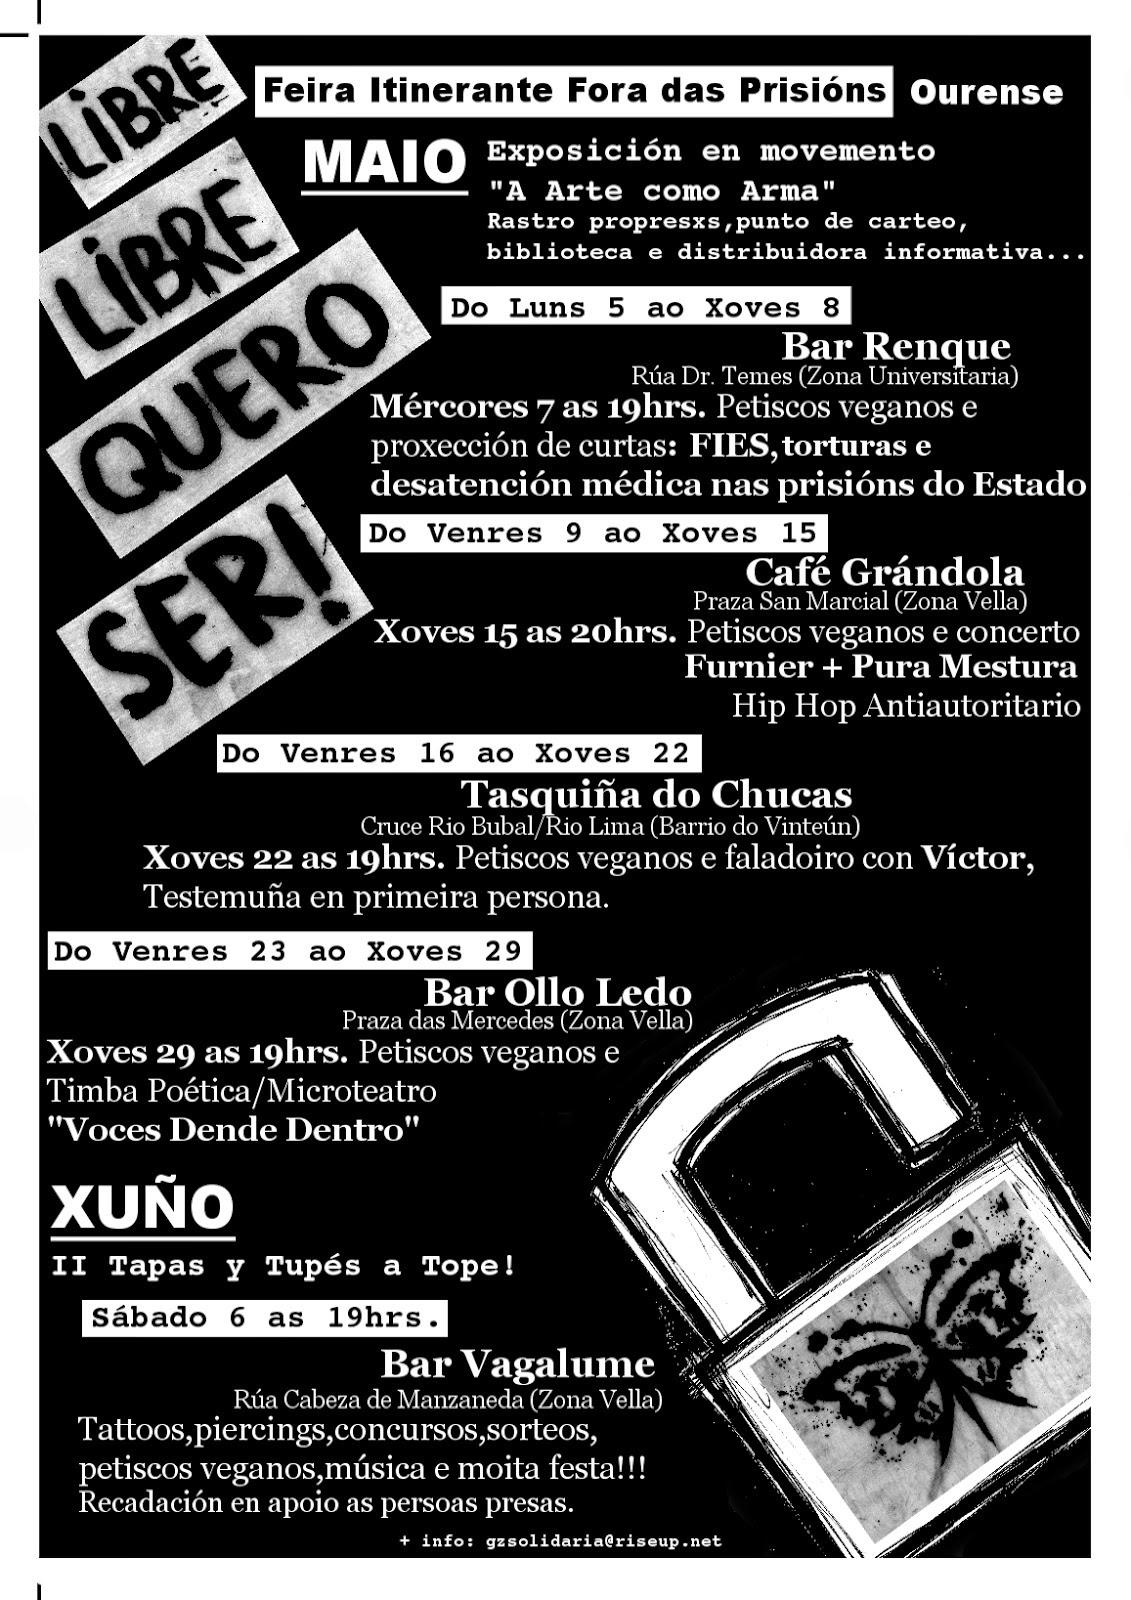 Ourense 05. Feria Itinerante